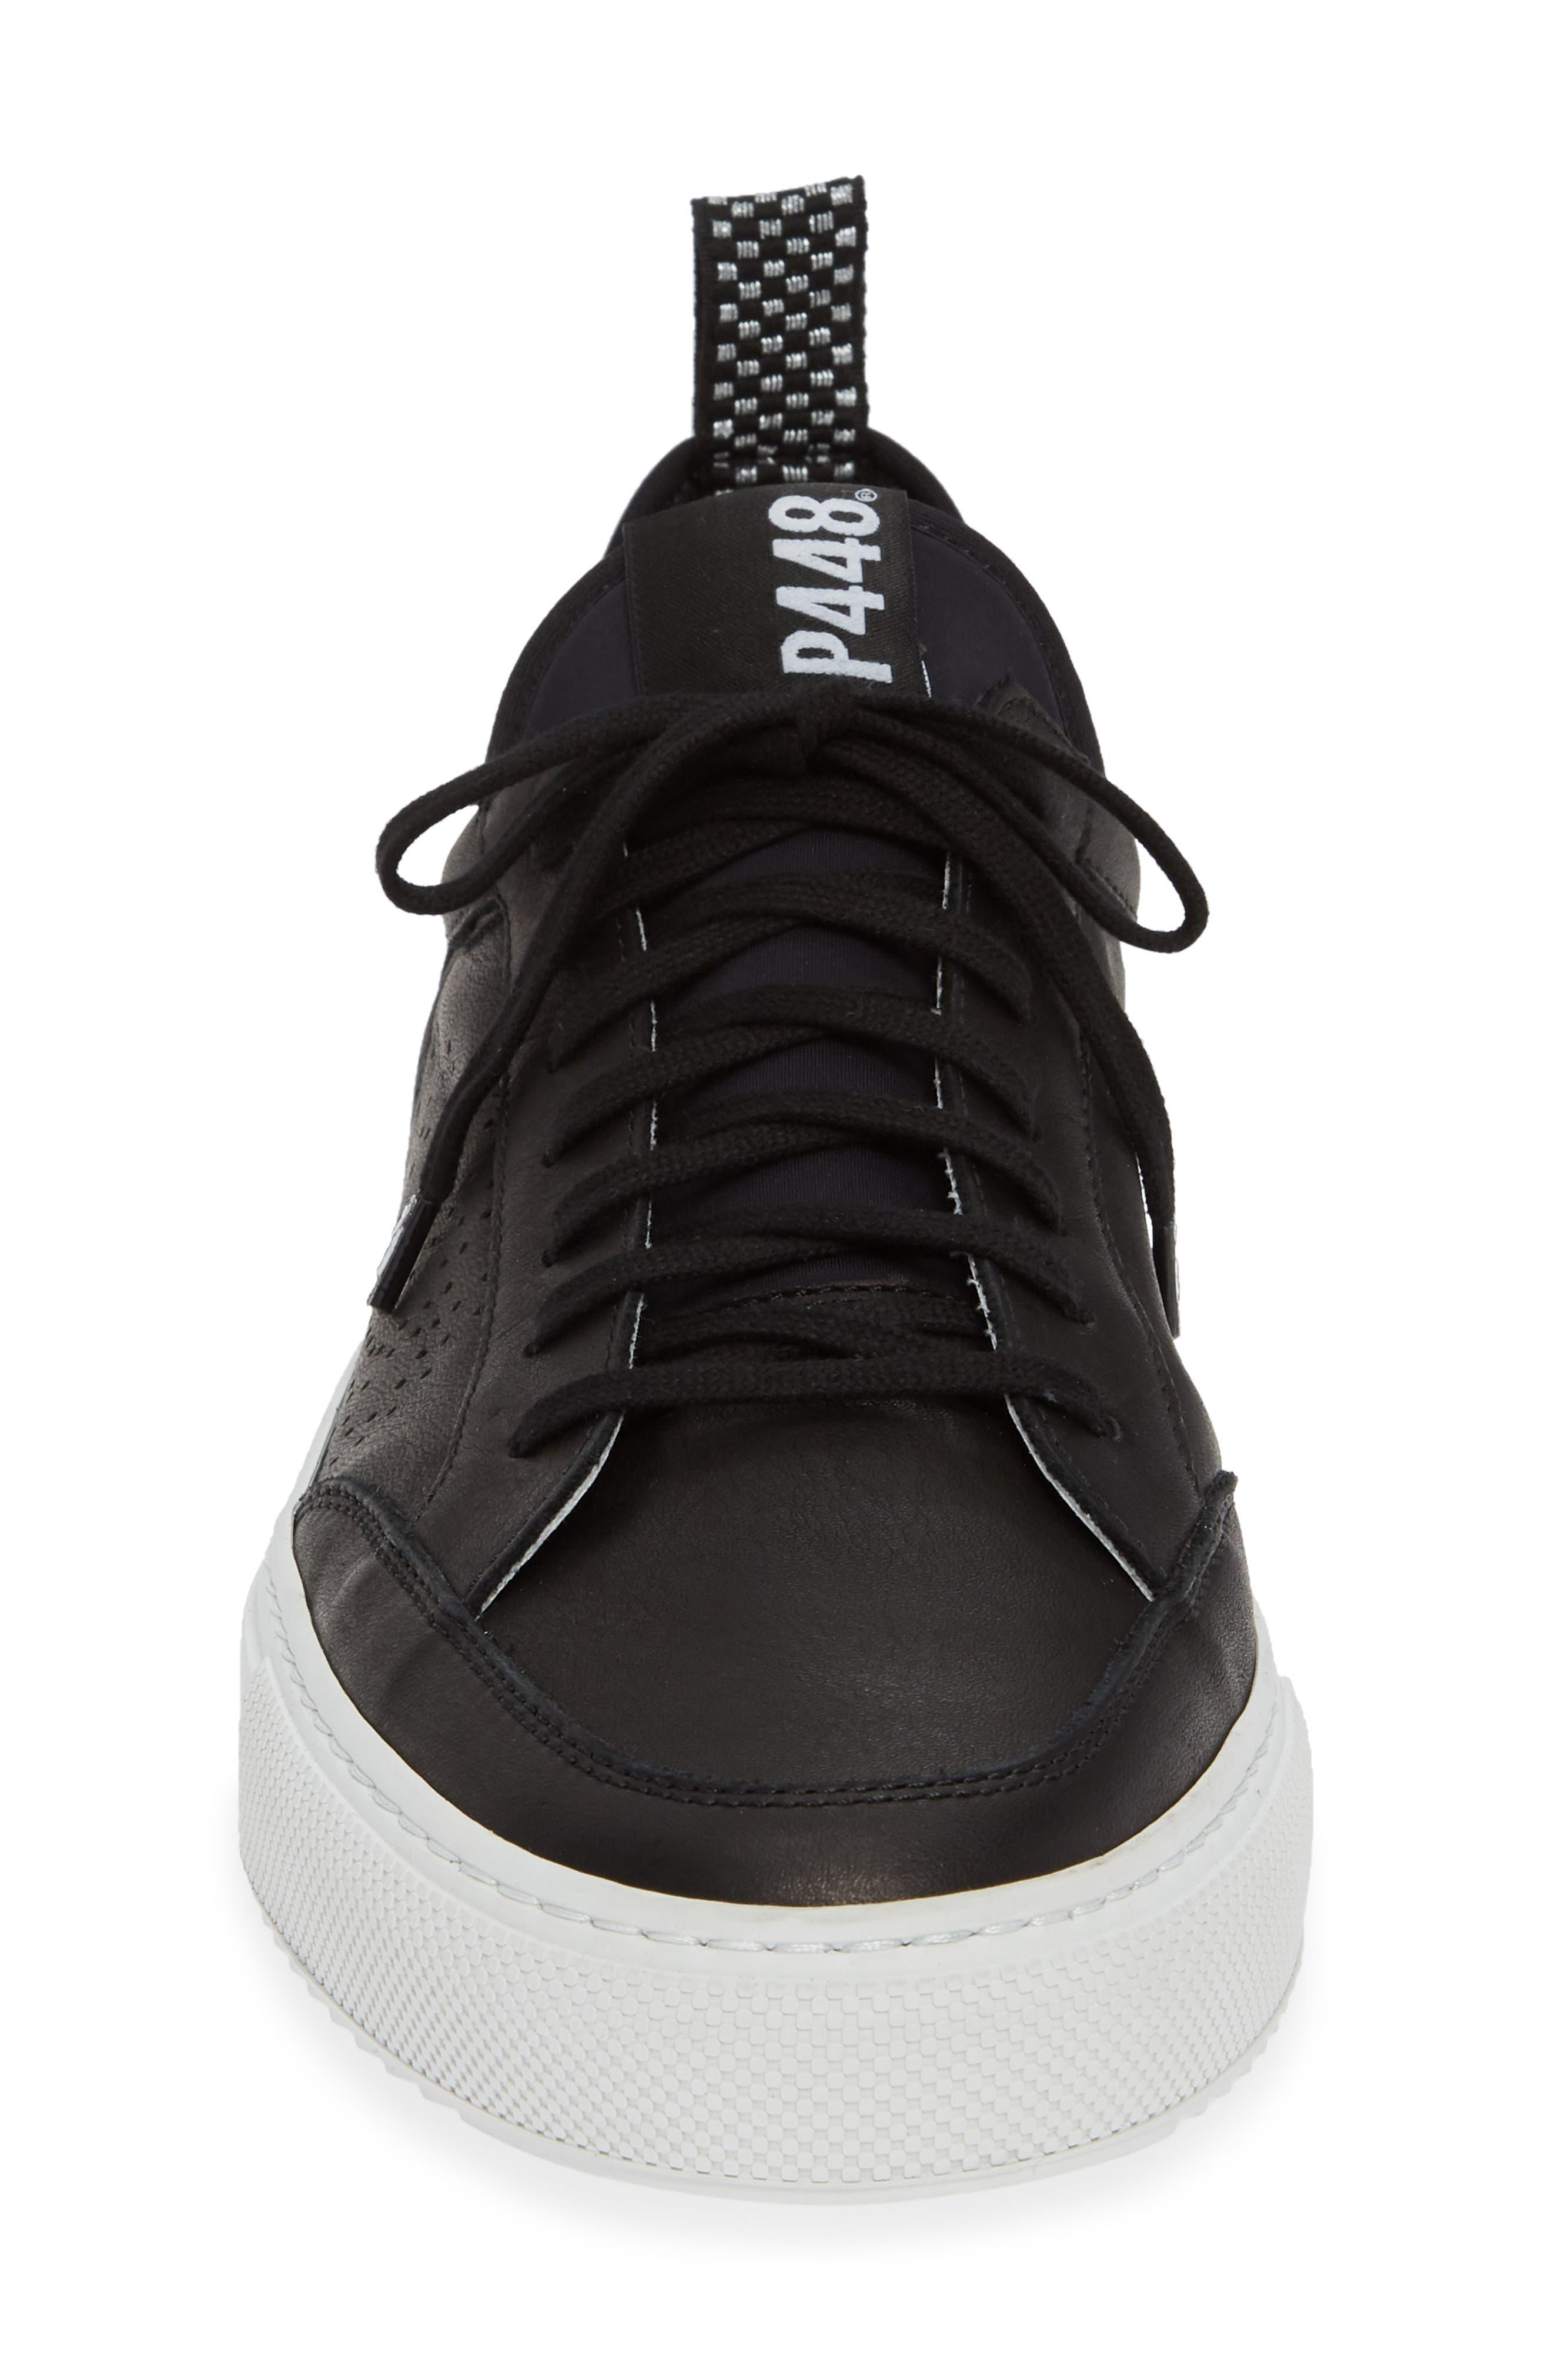 Absohosocks Sneaker,                             Alternate thumbnail 4, color,                             BLACK